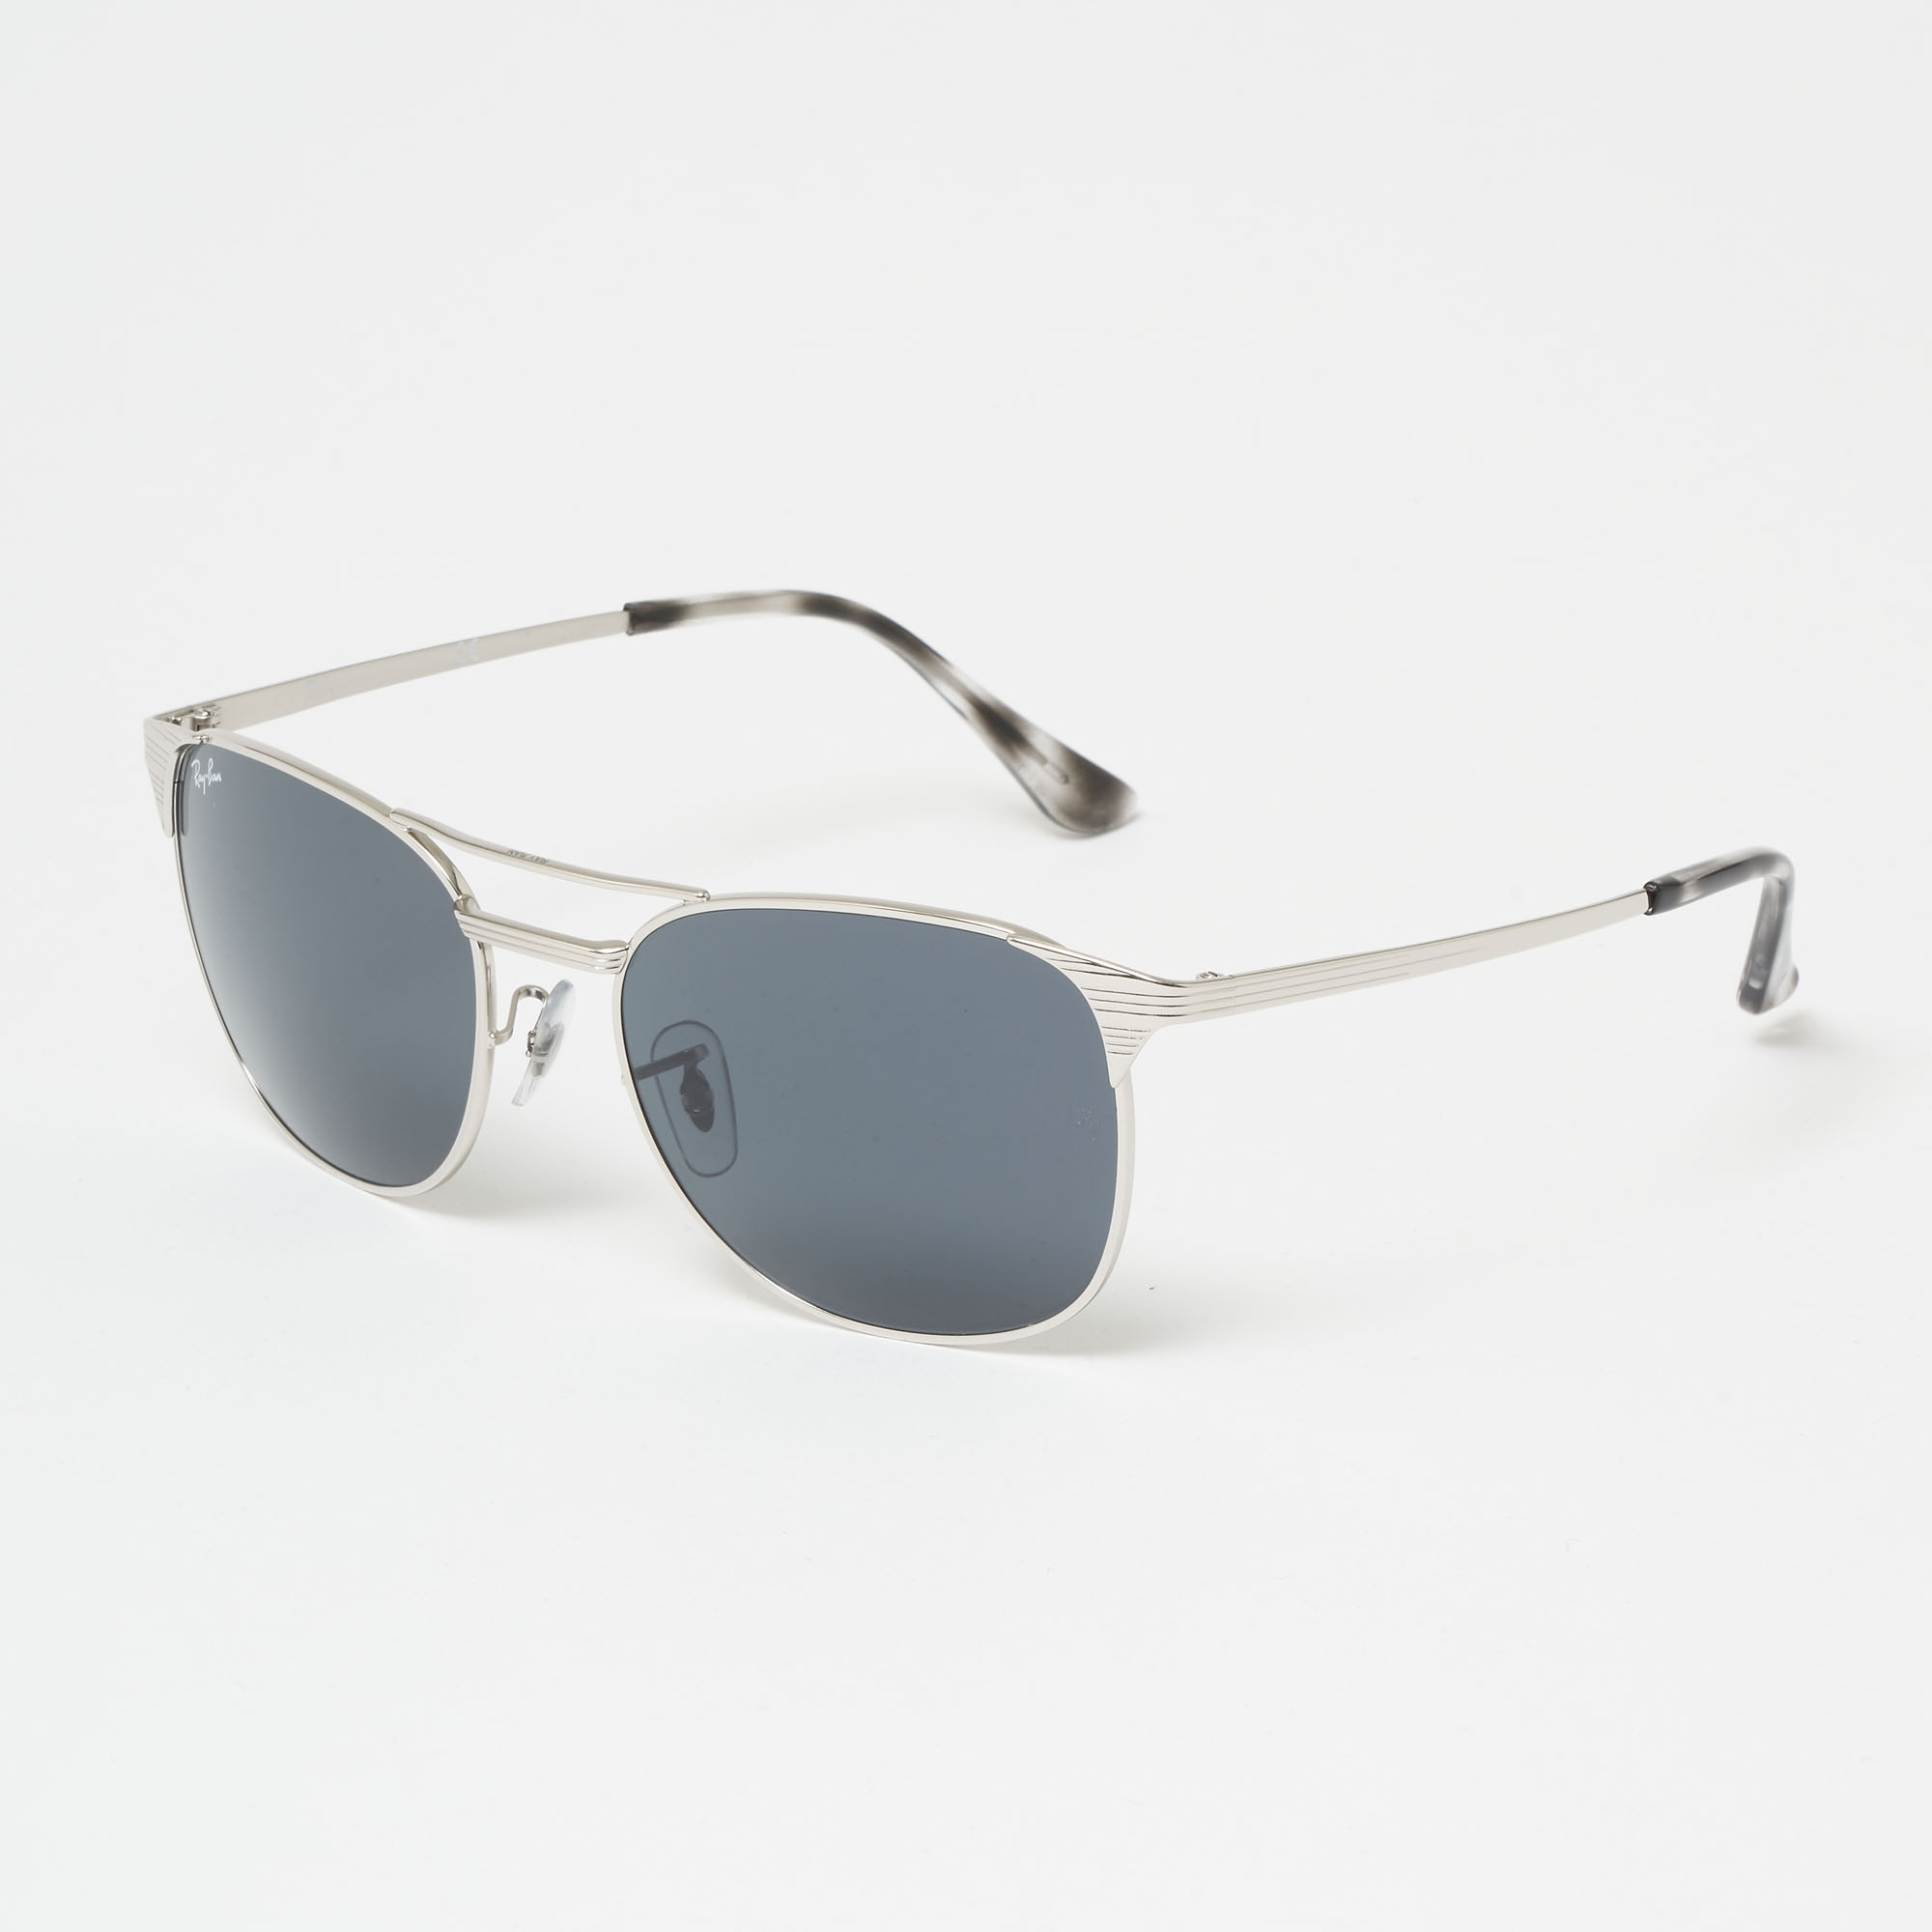 ad994a3c7b2 Chrome Signet Sunglasses - Blue Gray Classic Lenses